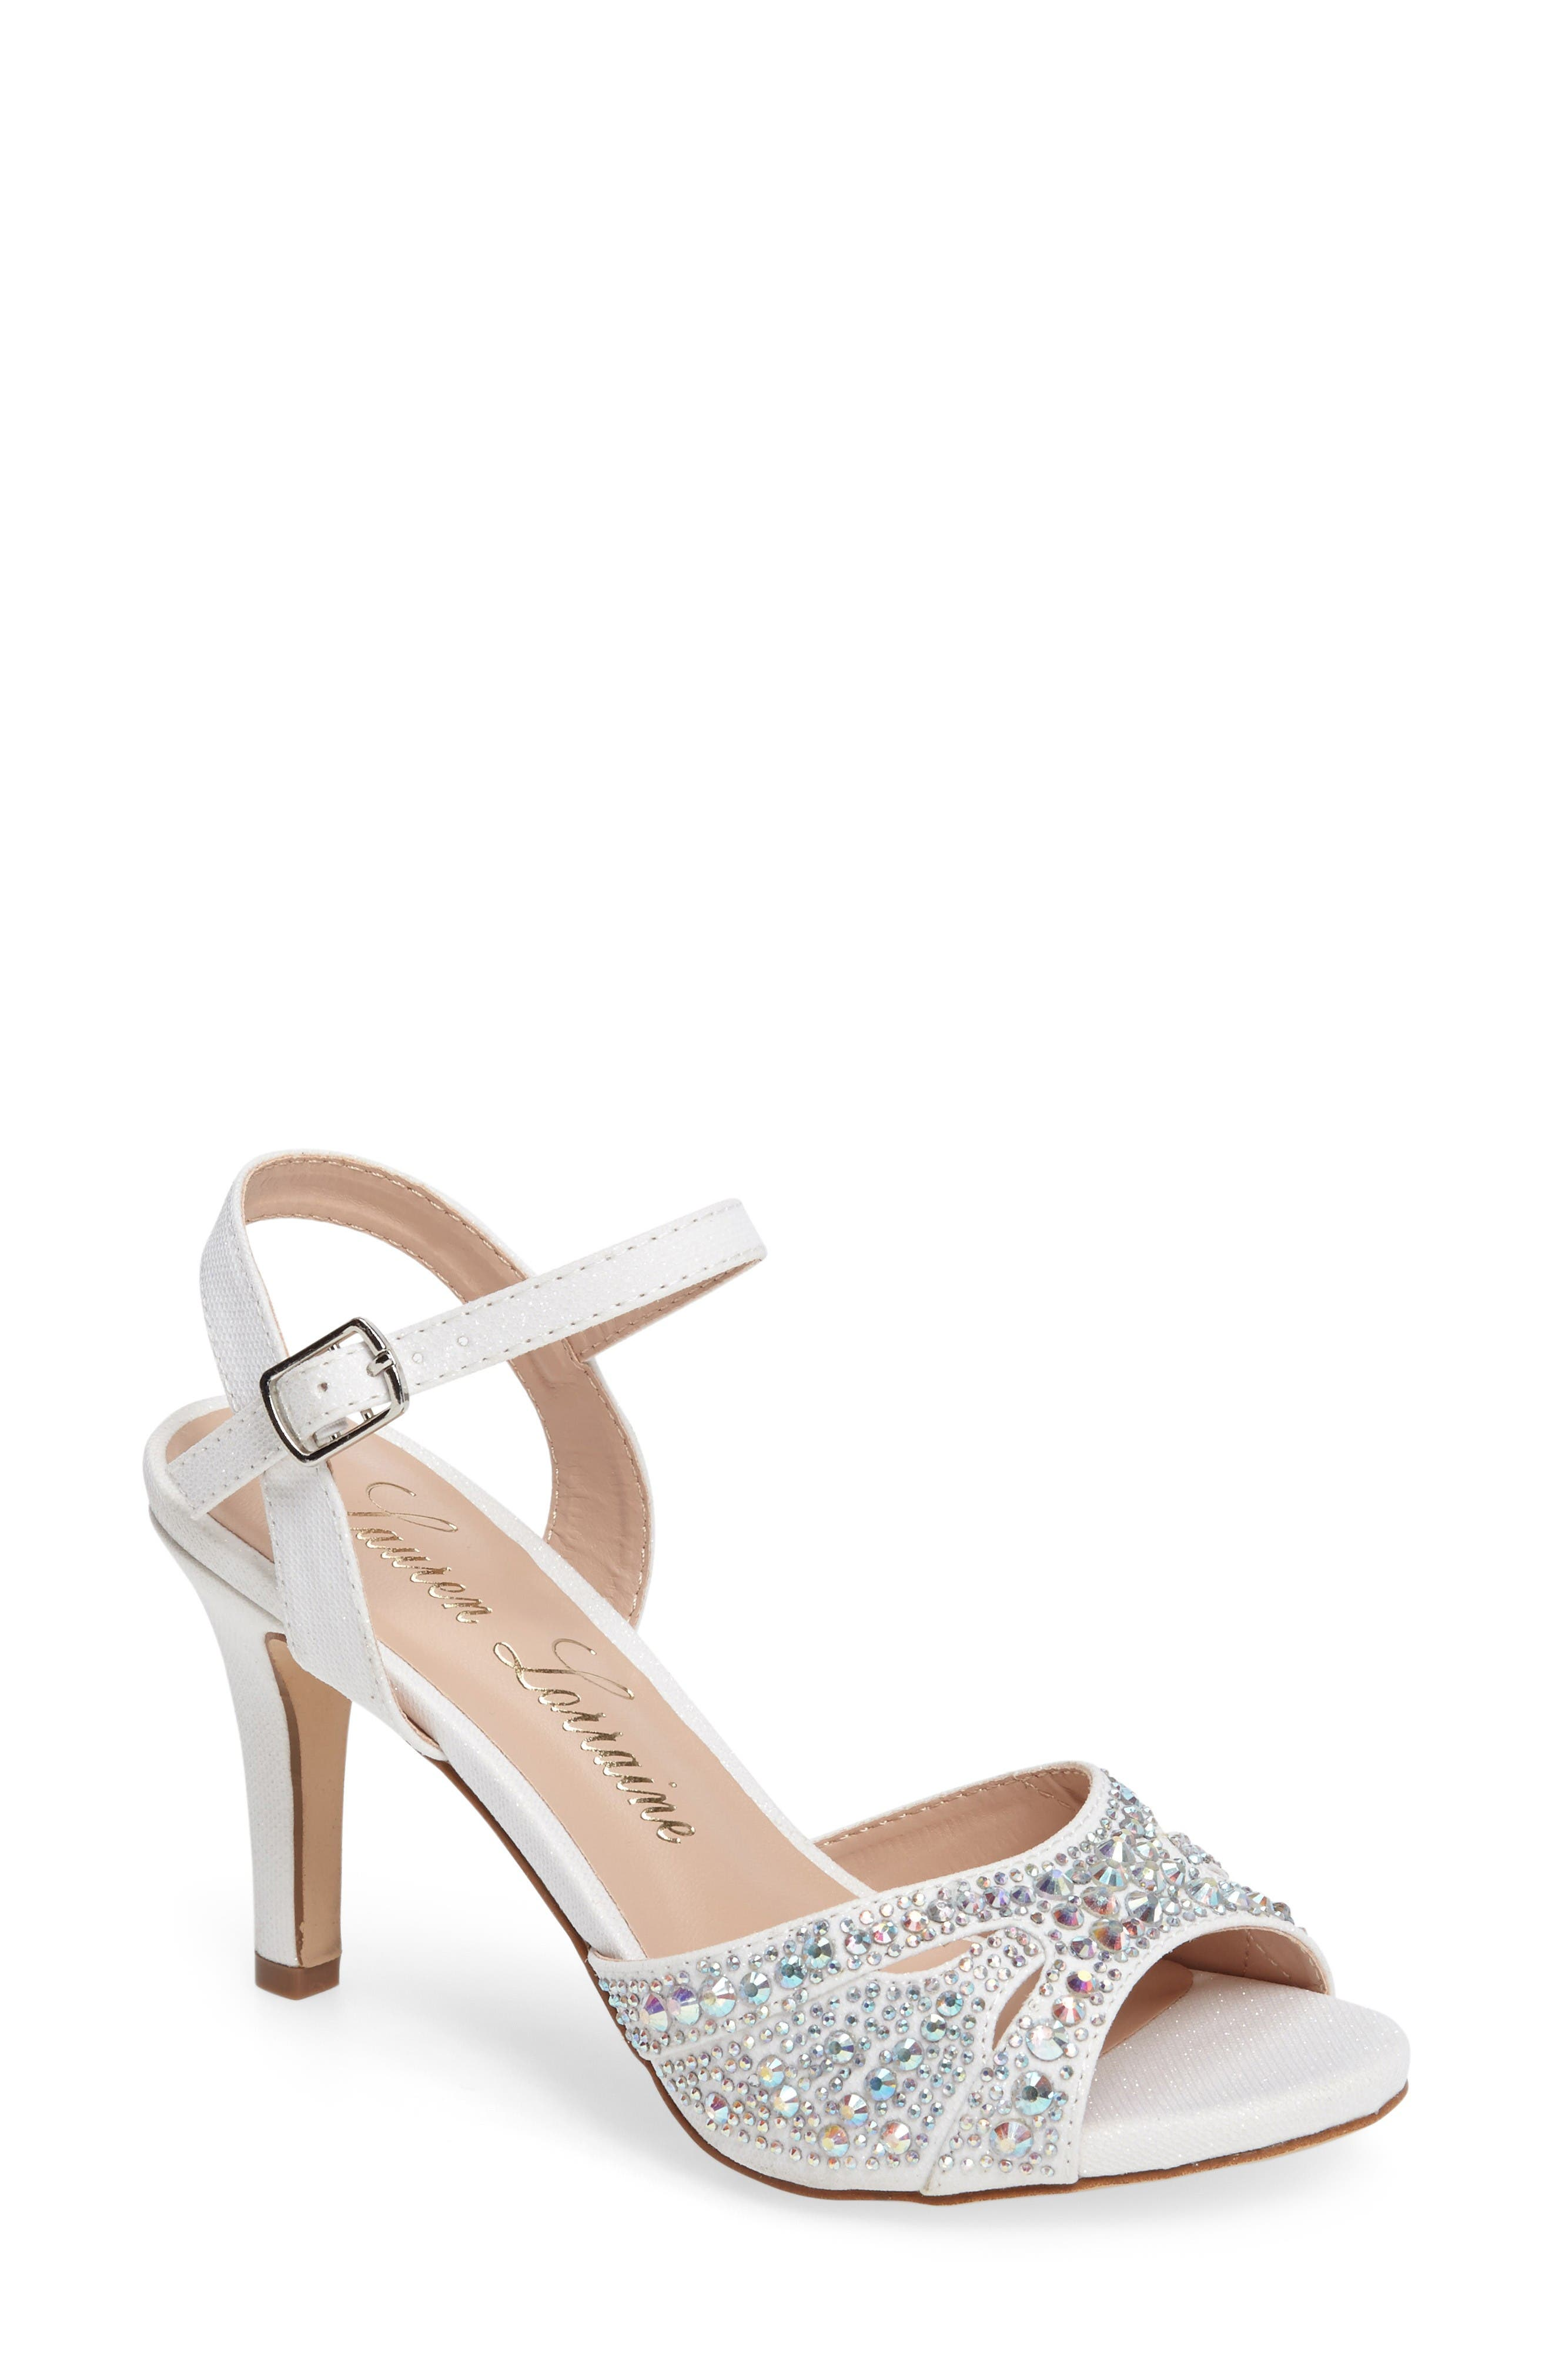 Main Image - Lauren Lorraine Florence Crystal Embellished Sandal (Women)